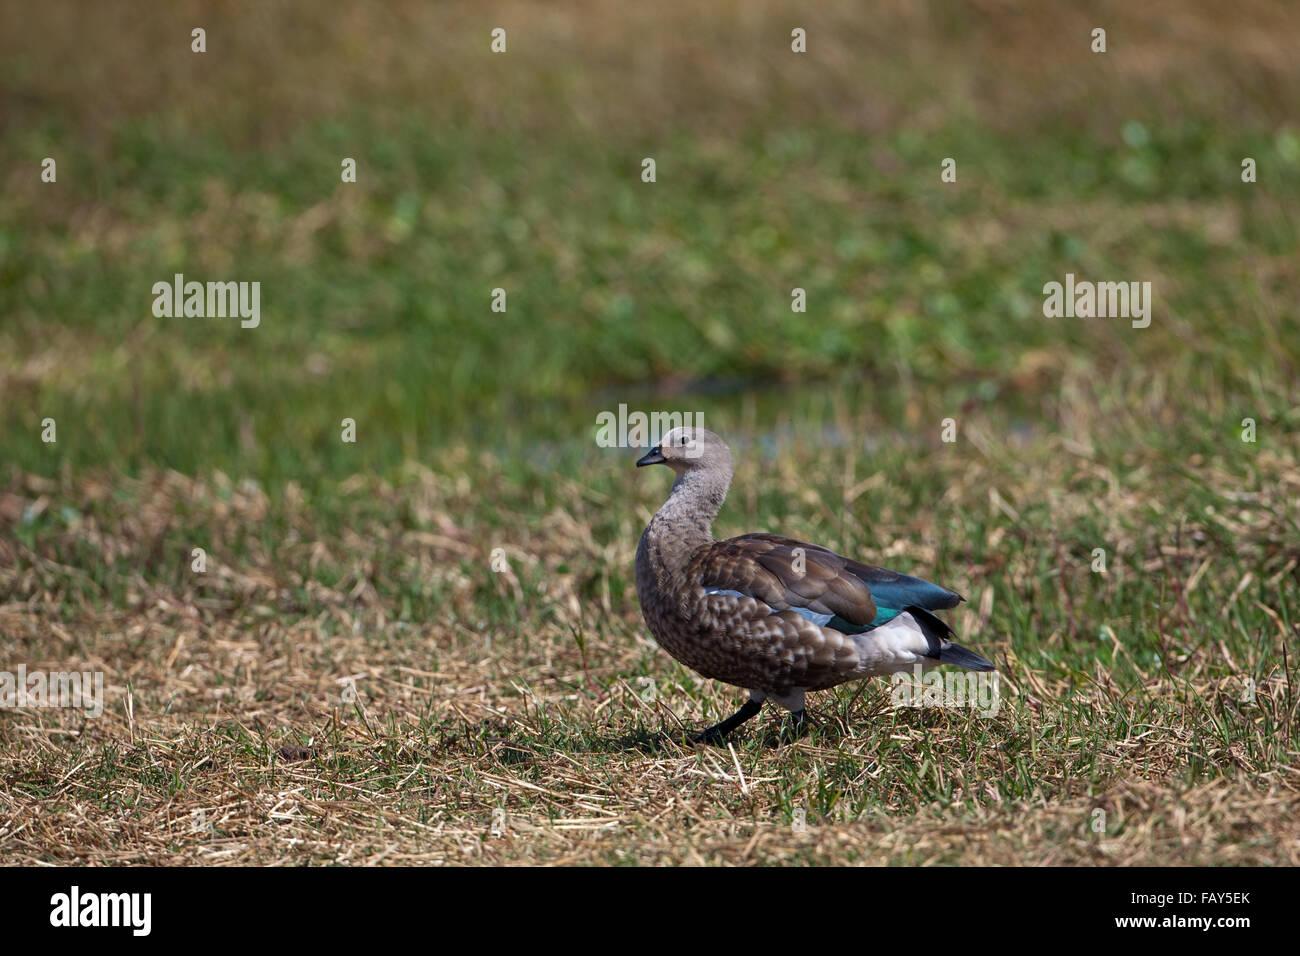 Abyssinian Blue-winged Goose (Cyanochen cyanopterus). Bale Mountains. Ethiopia. - Stock Image